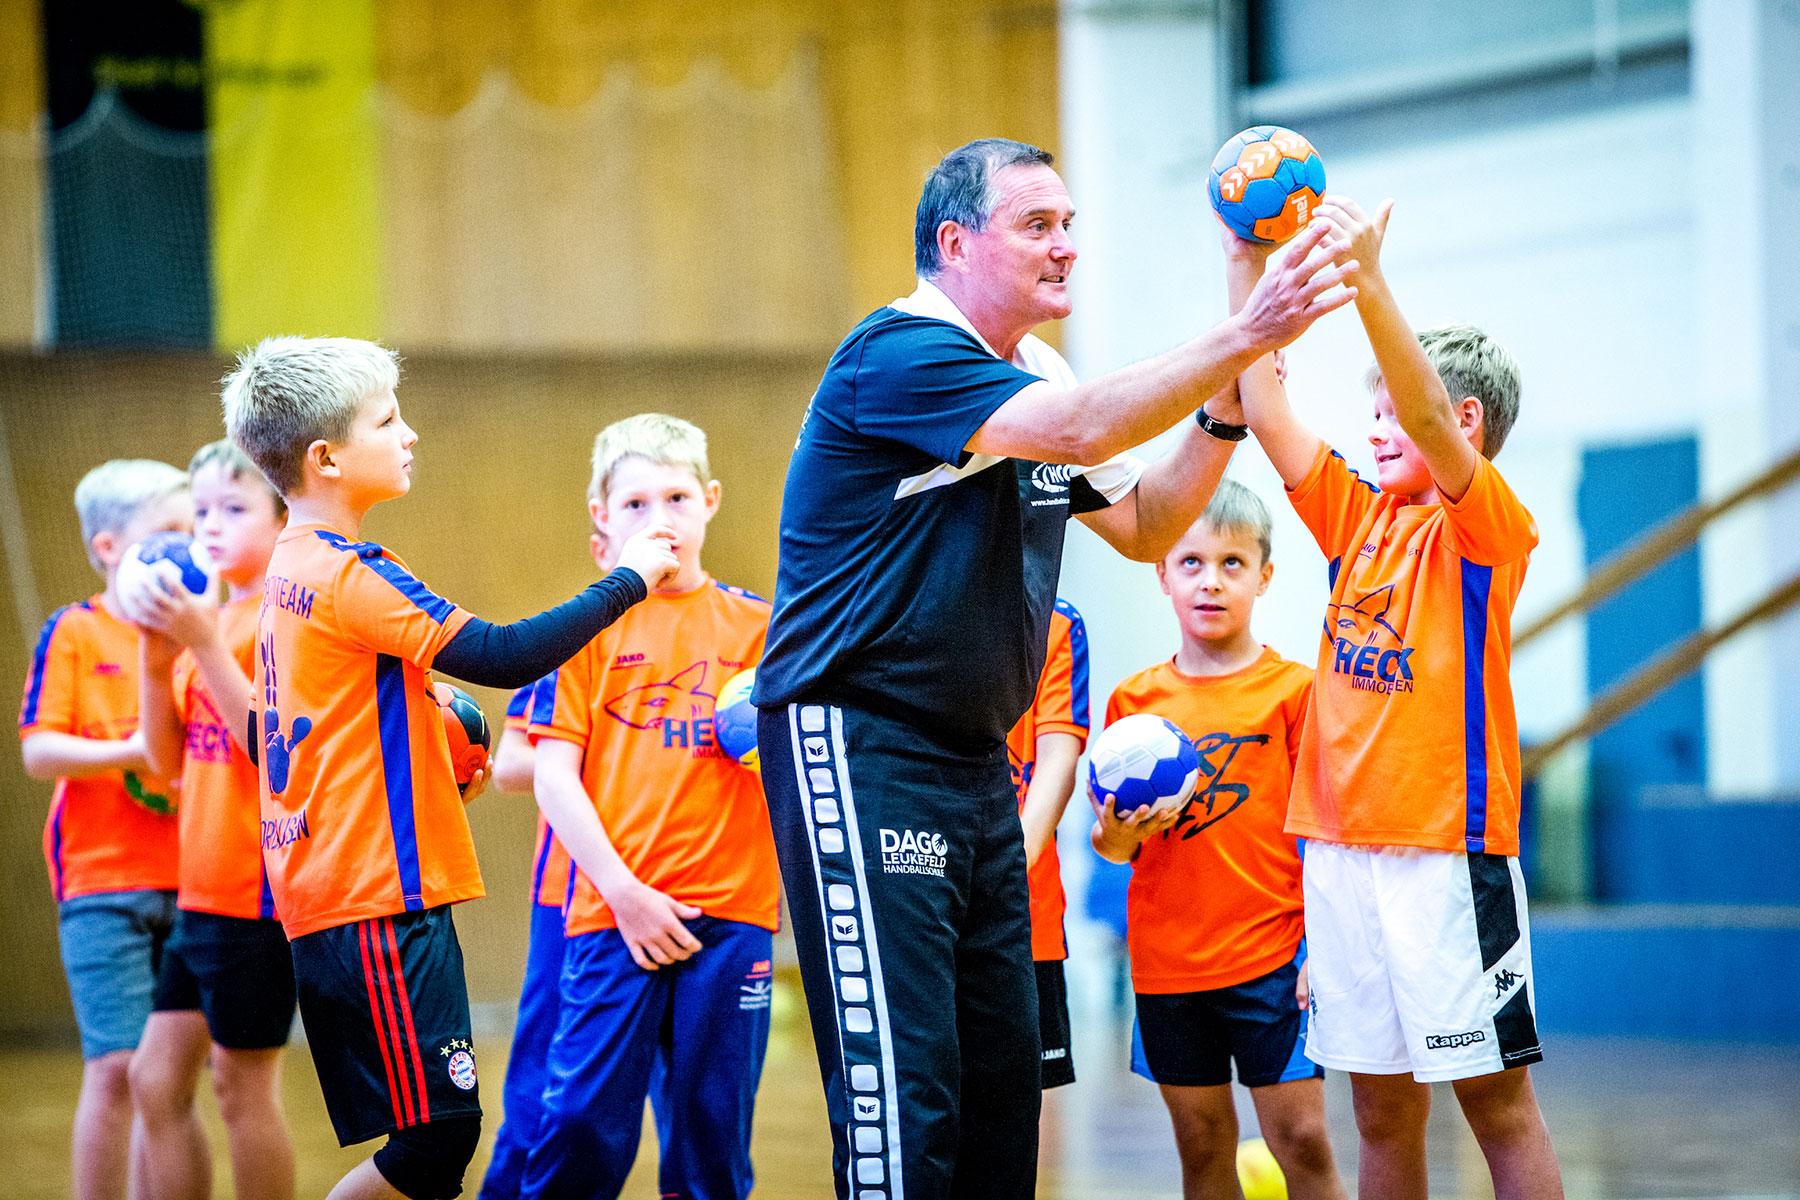 201809_Handballcamp_NDH (10)